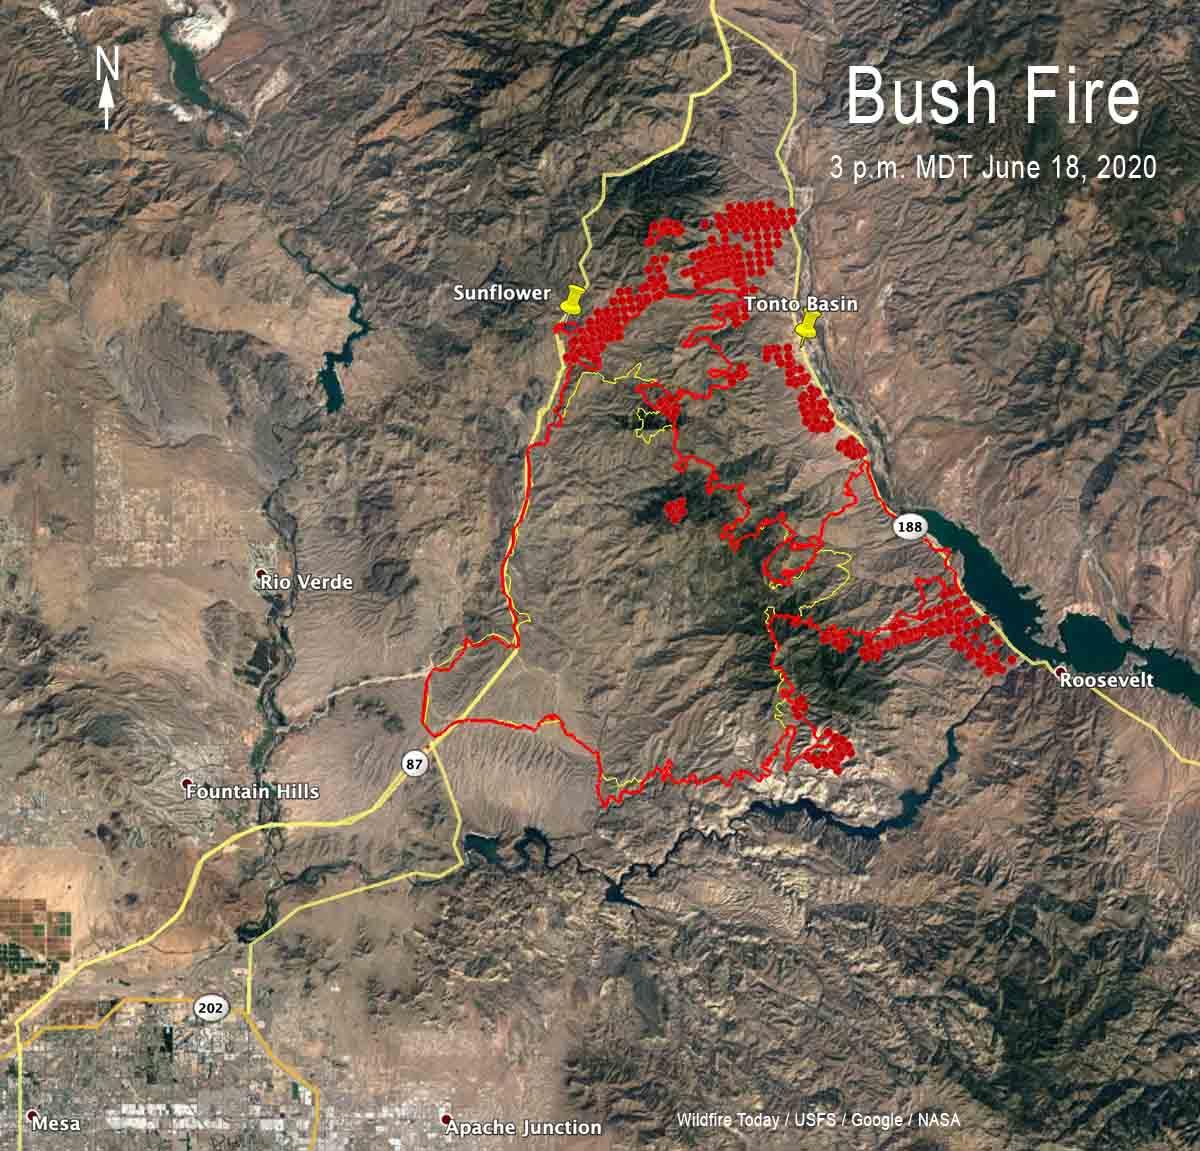 Bush Fire map 3 pm MDT June 18, 2020 wildfire Arizona Phoenix